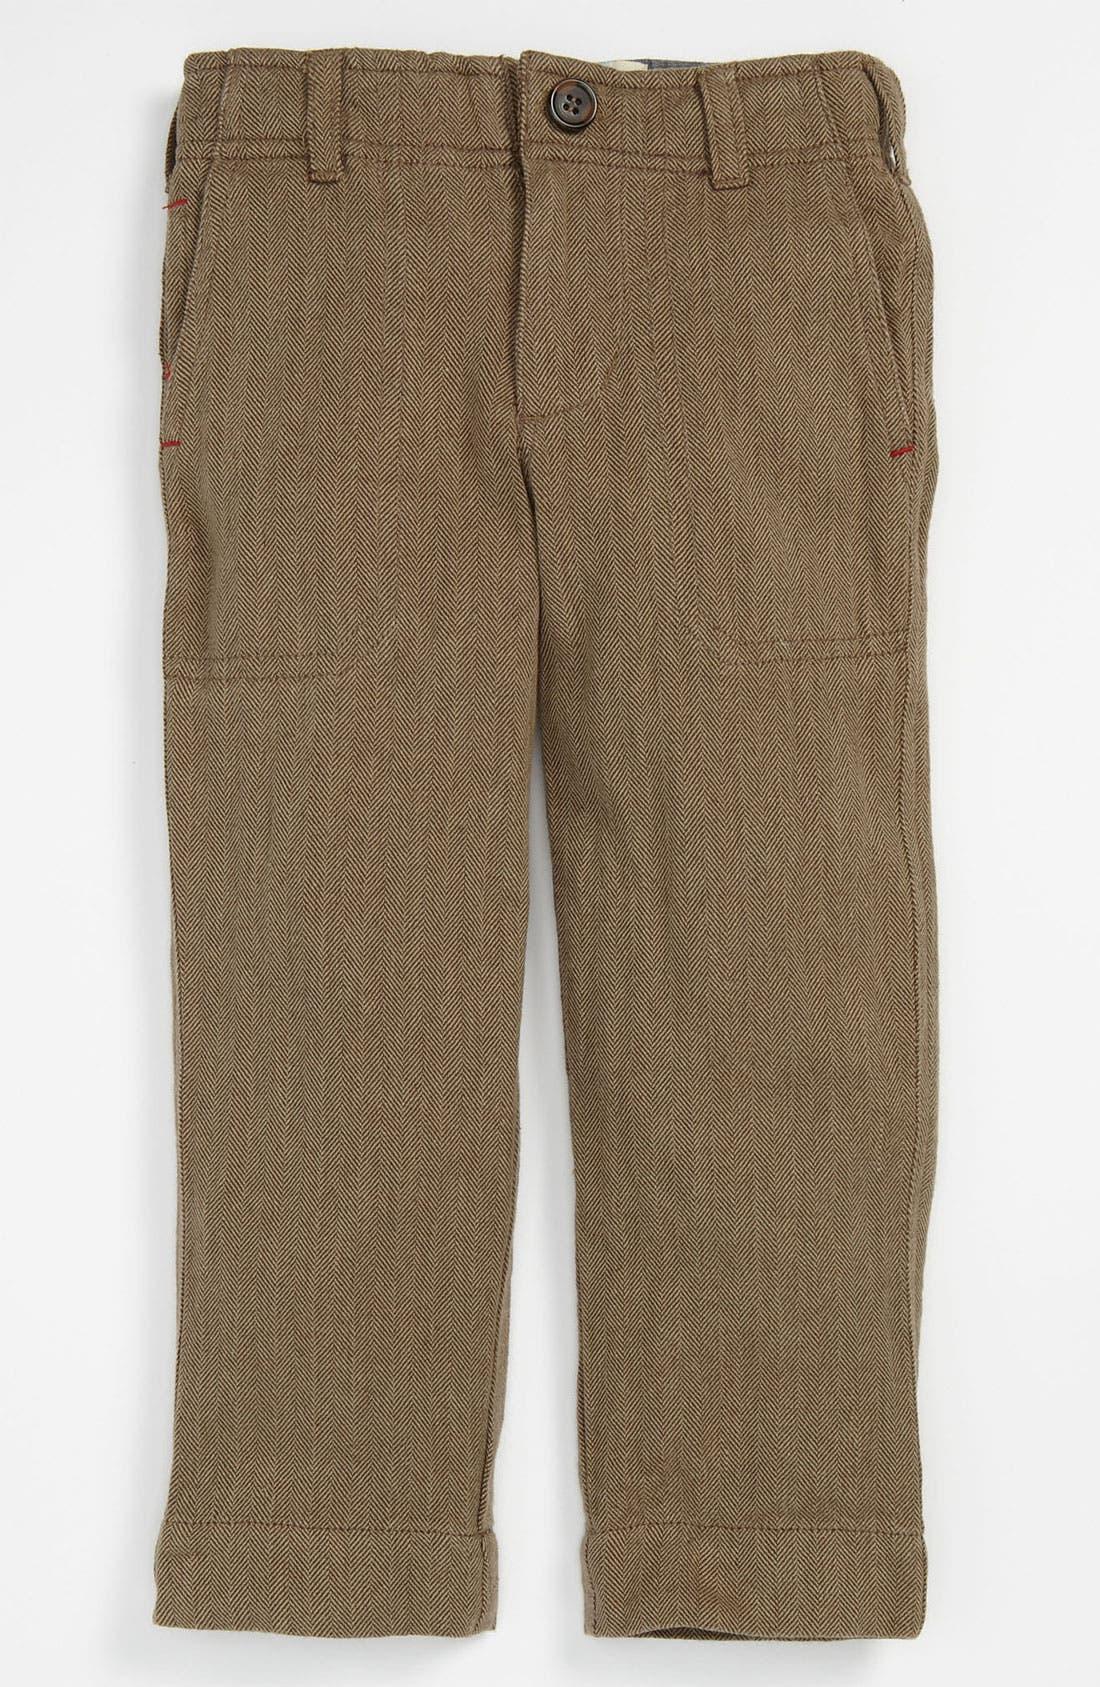 Main Image - Peek 'Homestead' Herringbone Pants (Toddler, Little Boys & Big Boys)